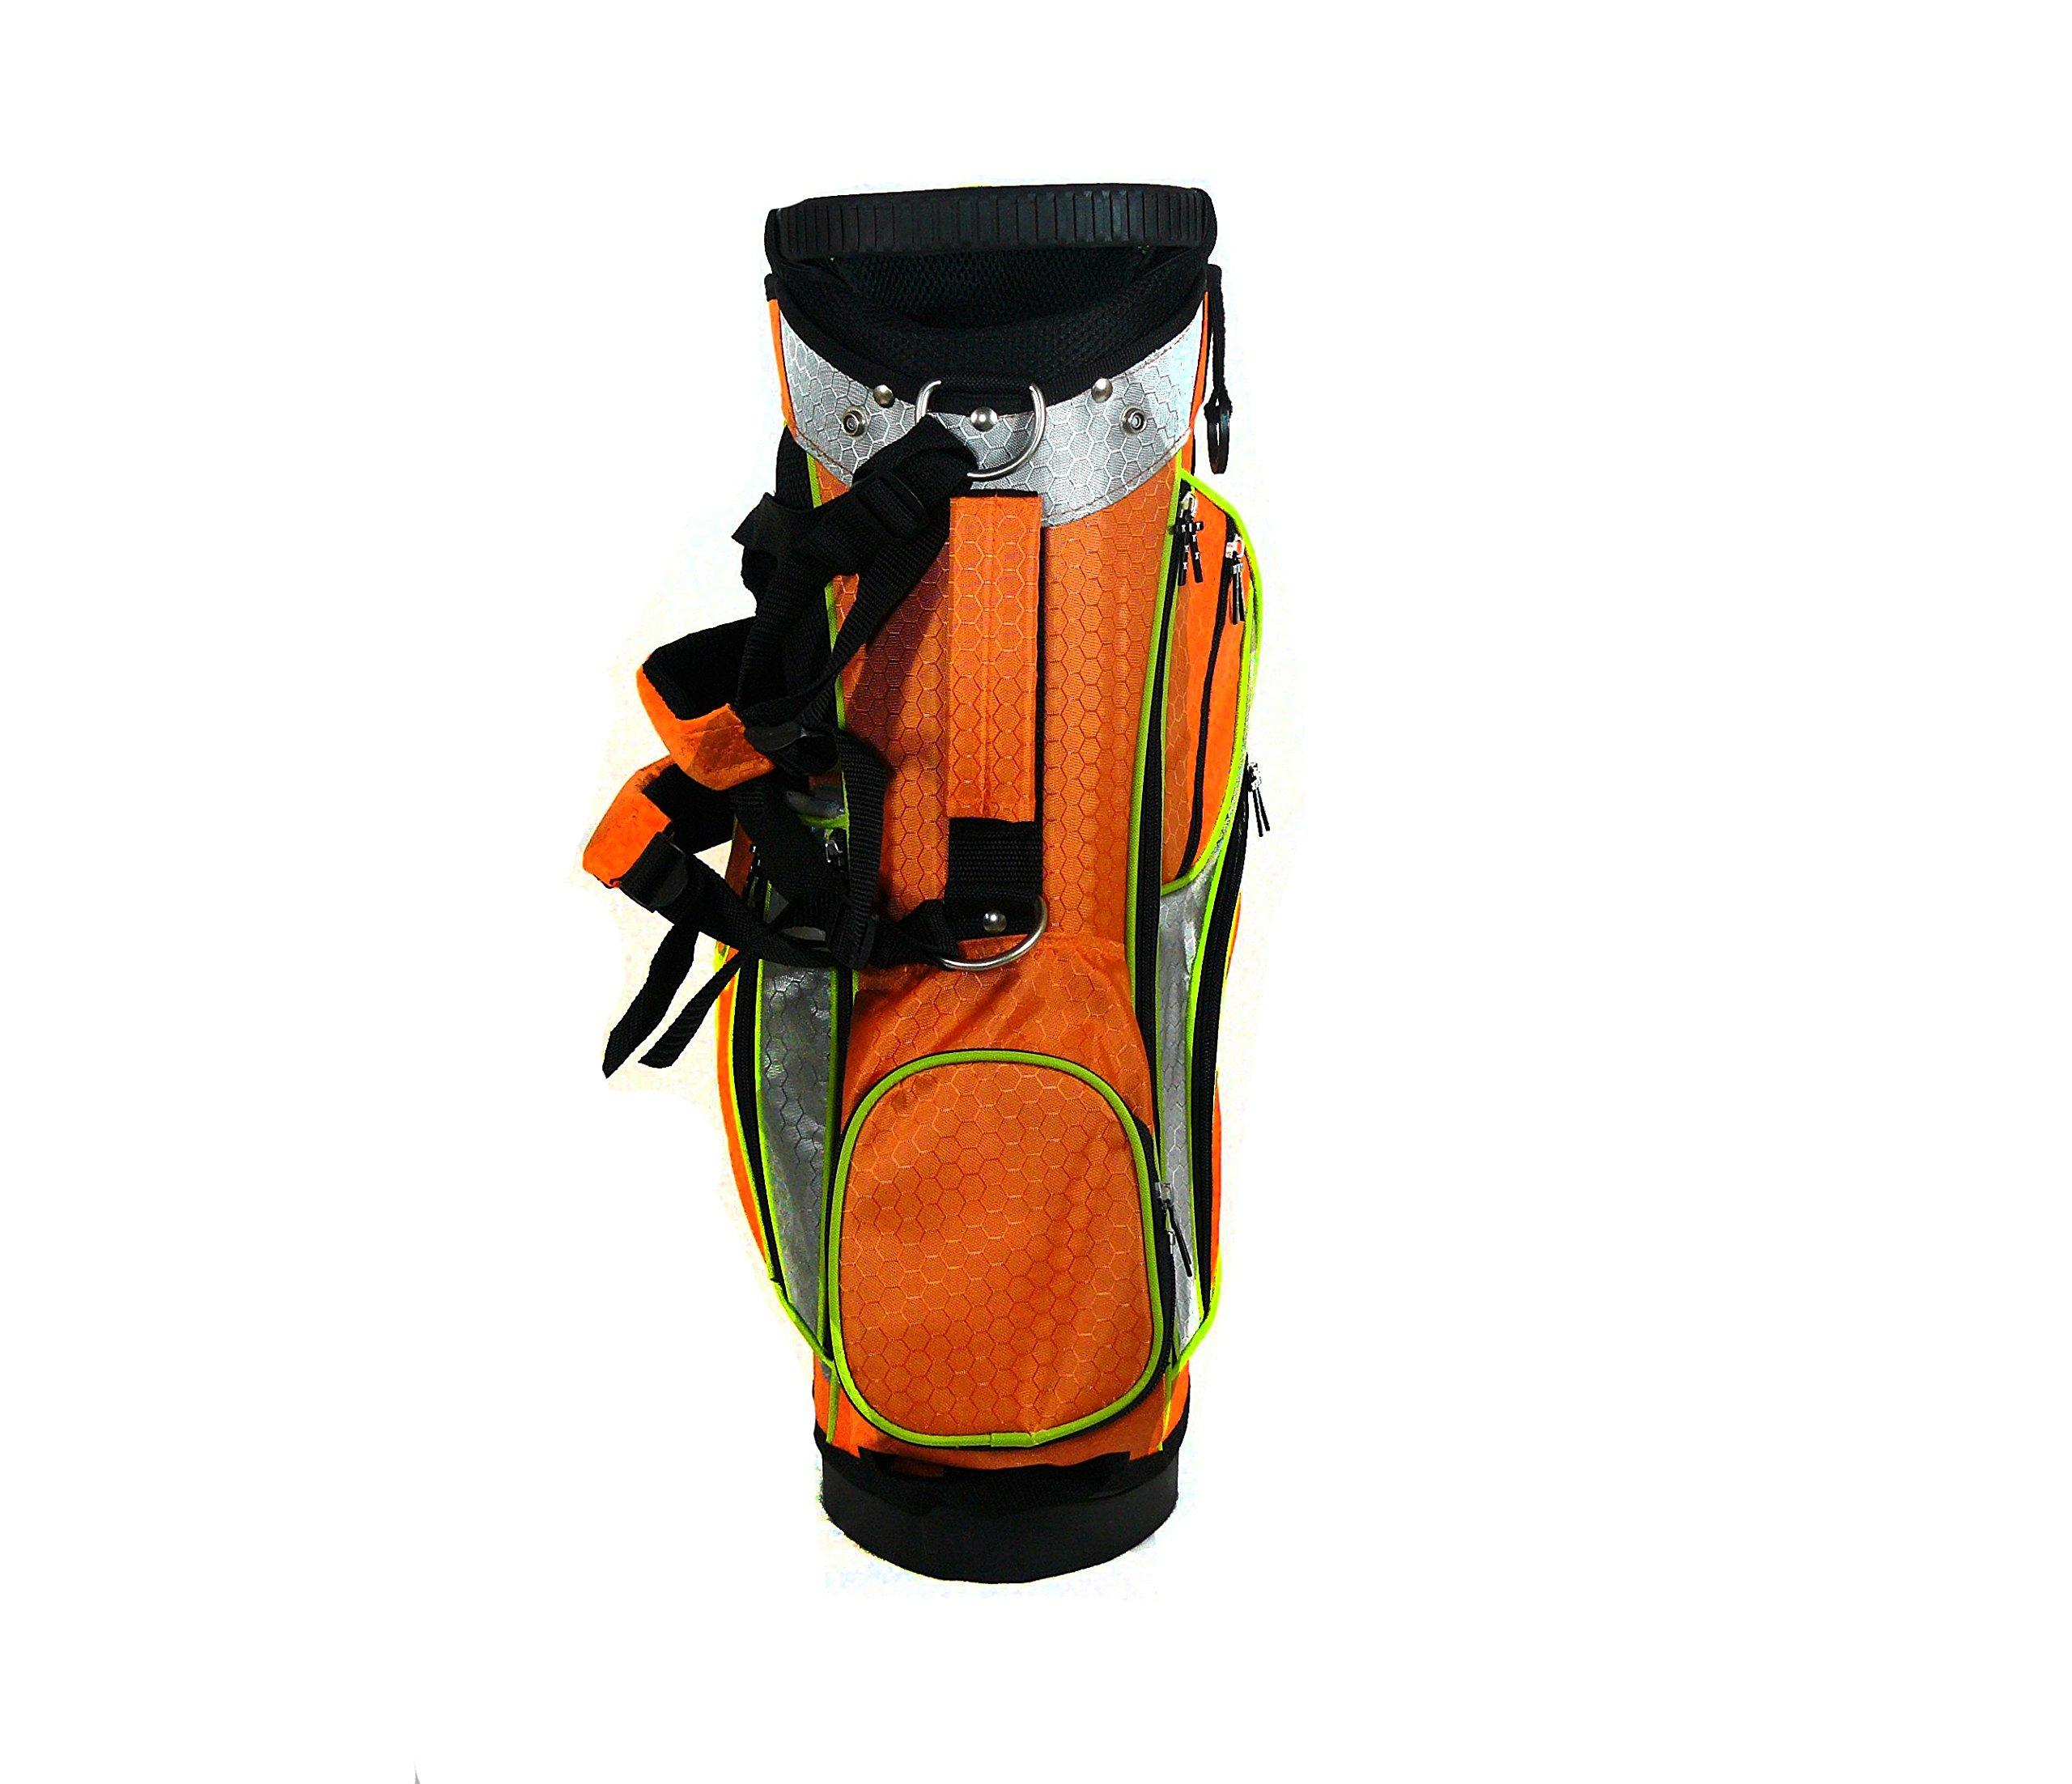 Droc - Mica Golf Bag Age 3 - 6 (22'' Tall) by droc (Image #3)